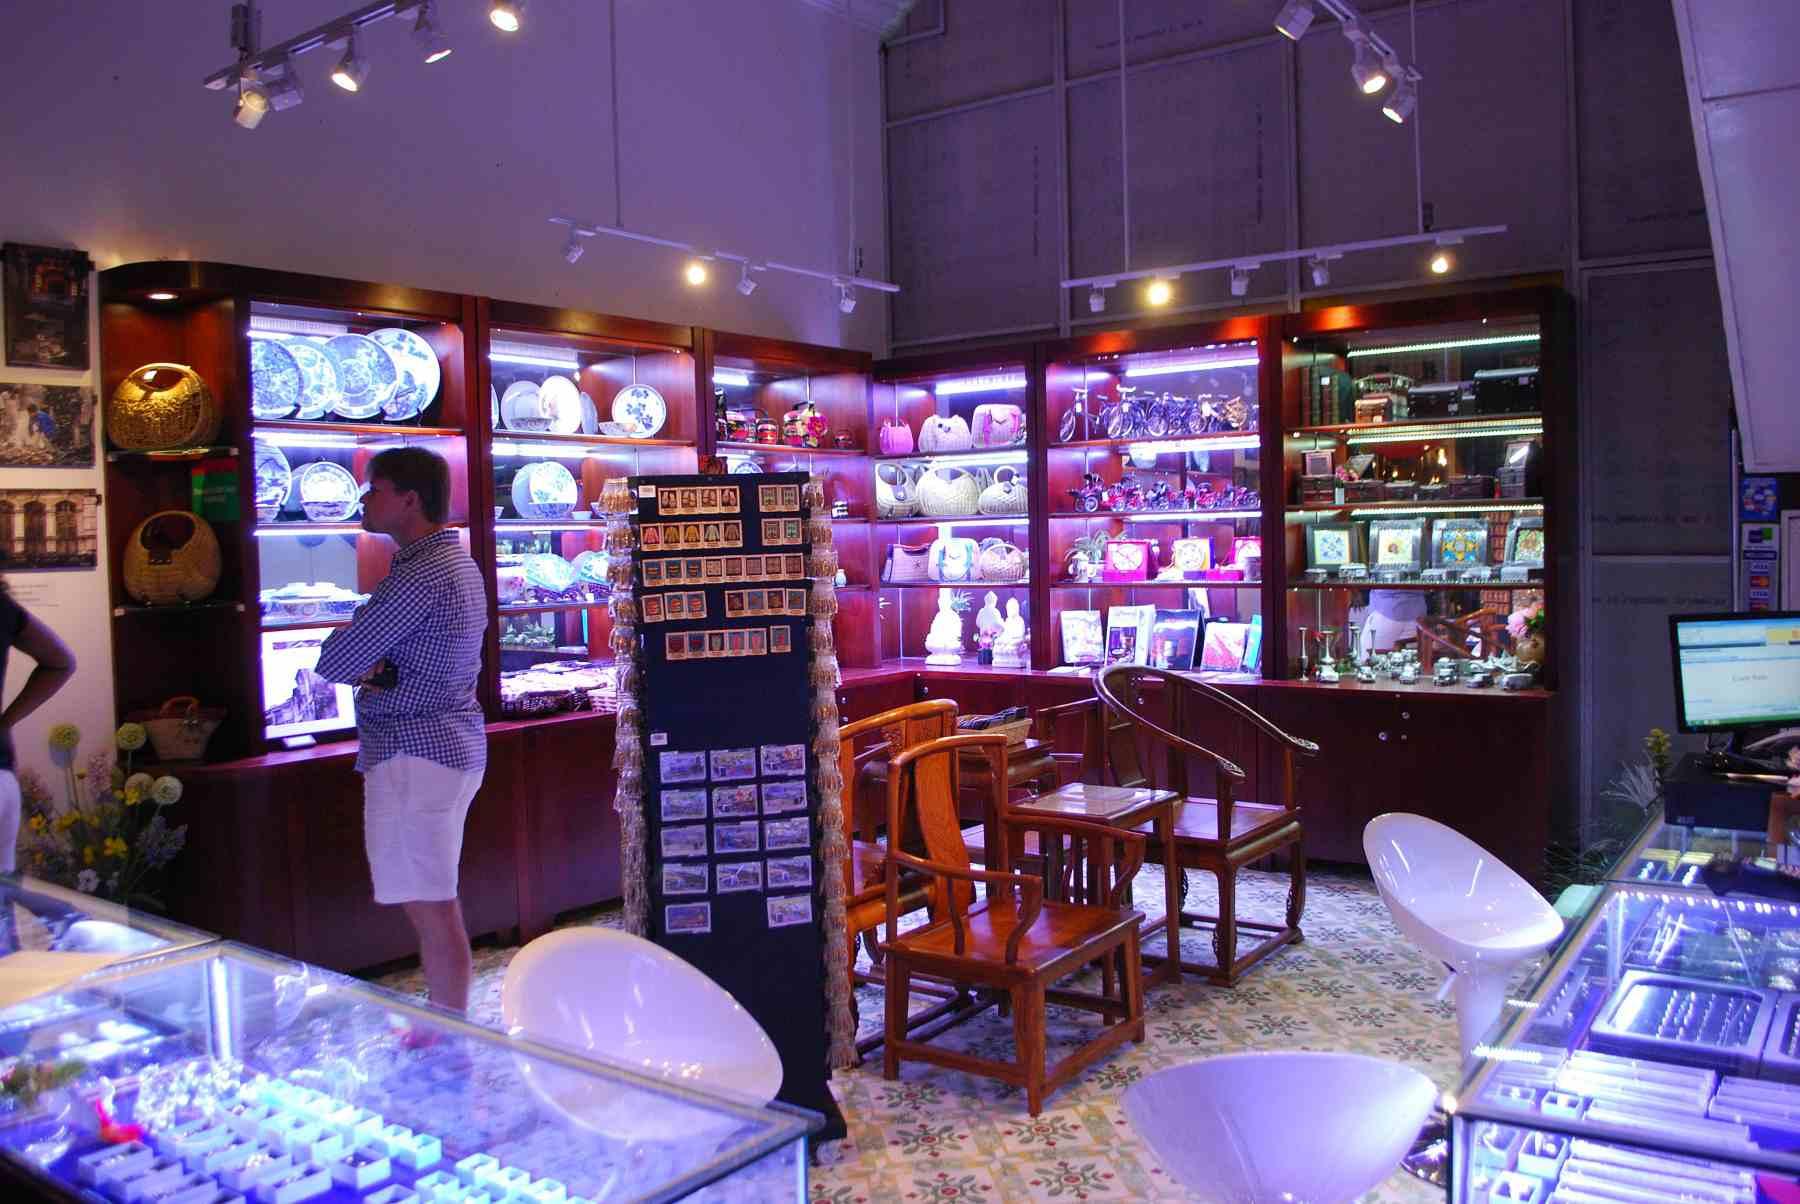 Jewelry and chinaware display at the Peranakan Museum